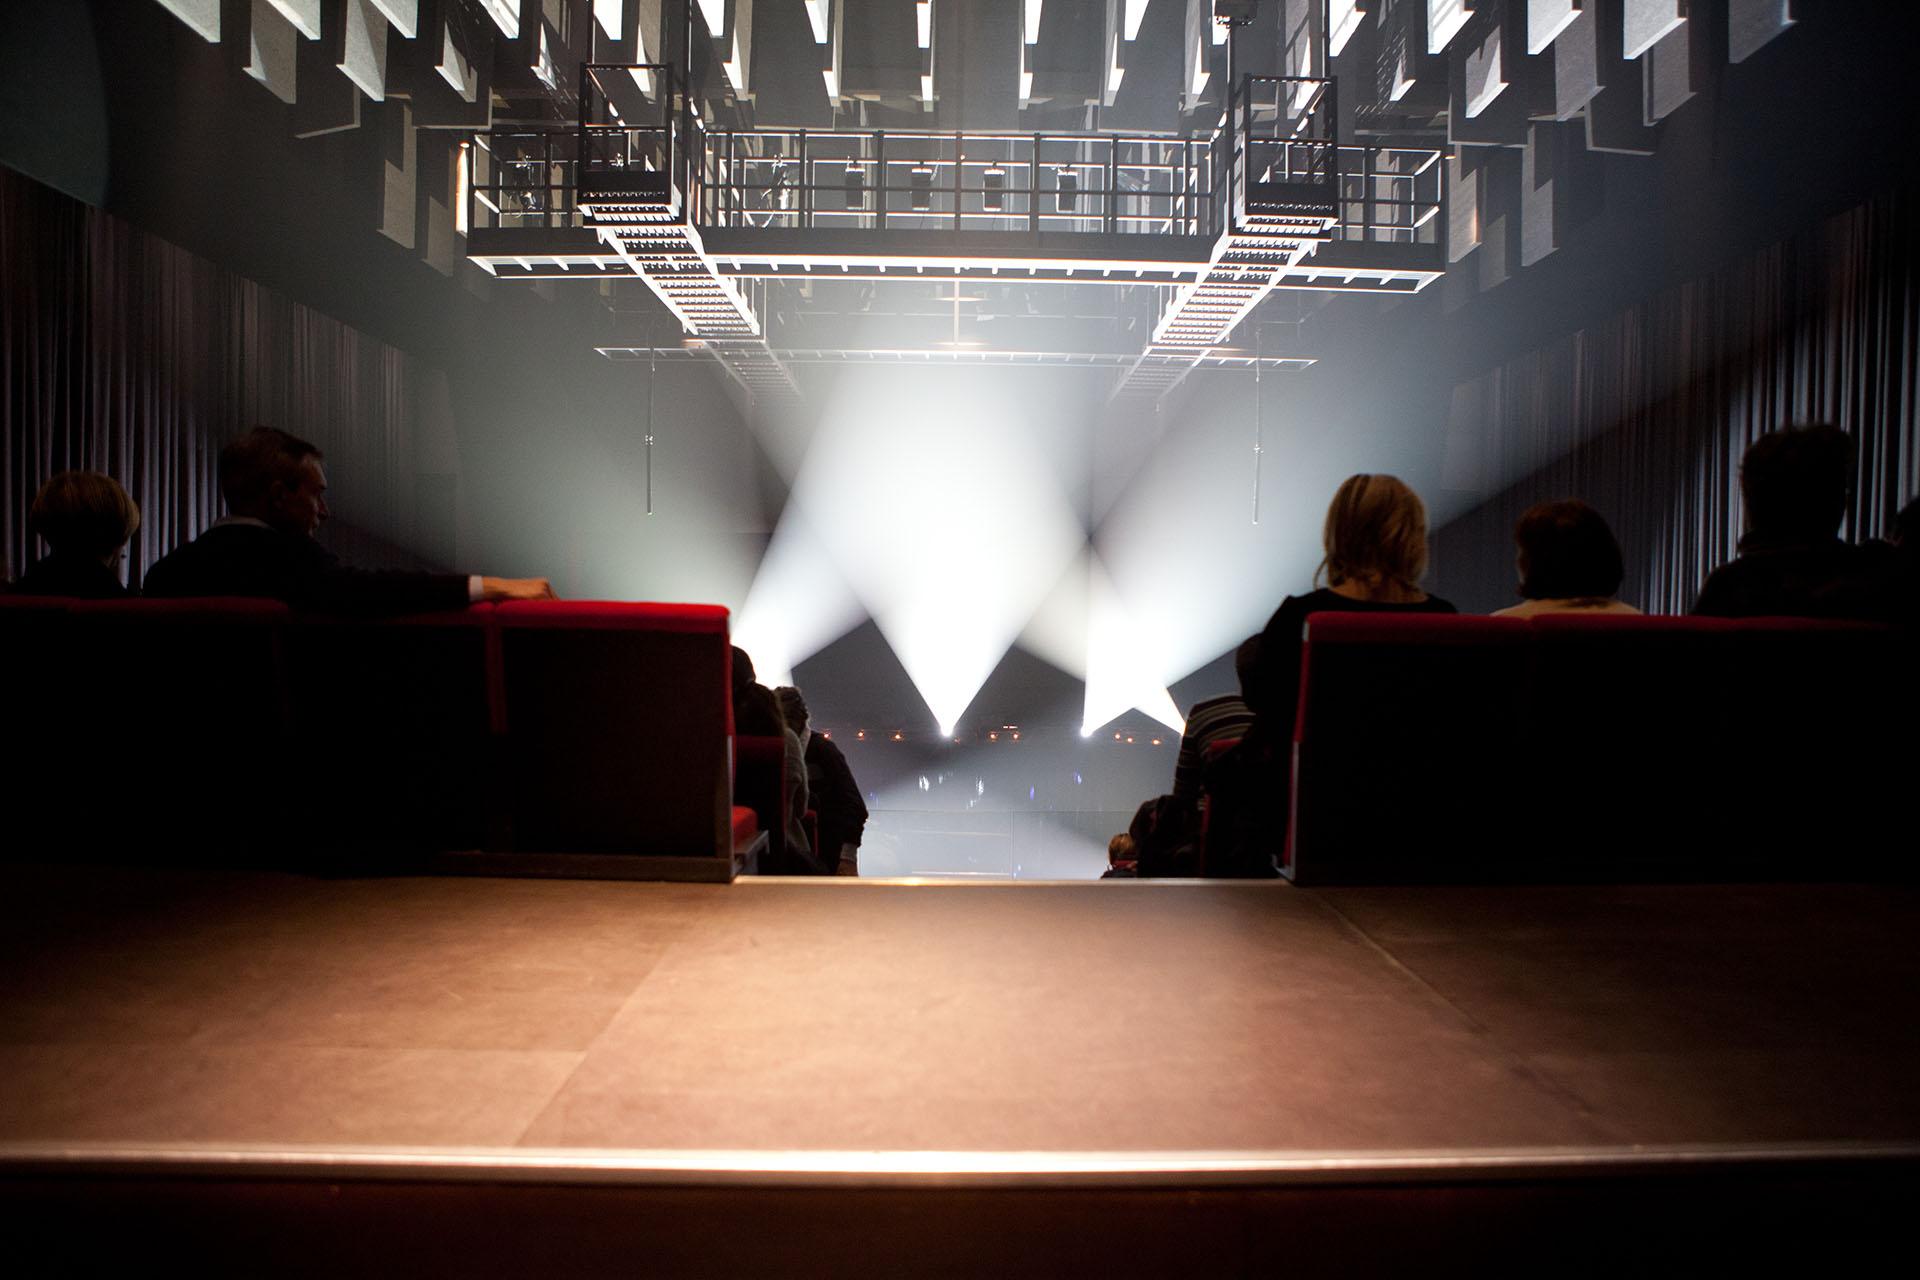 teatro colosseo 07